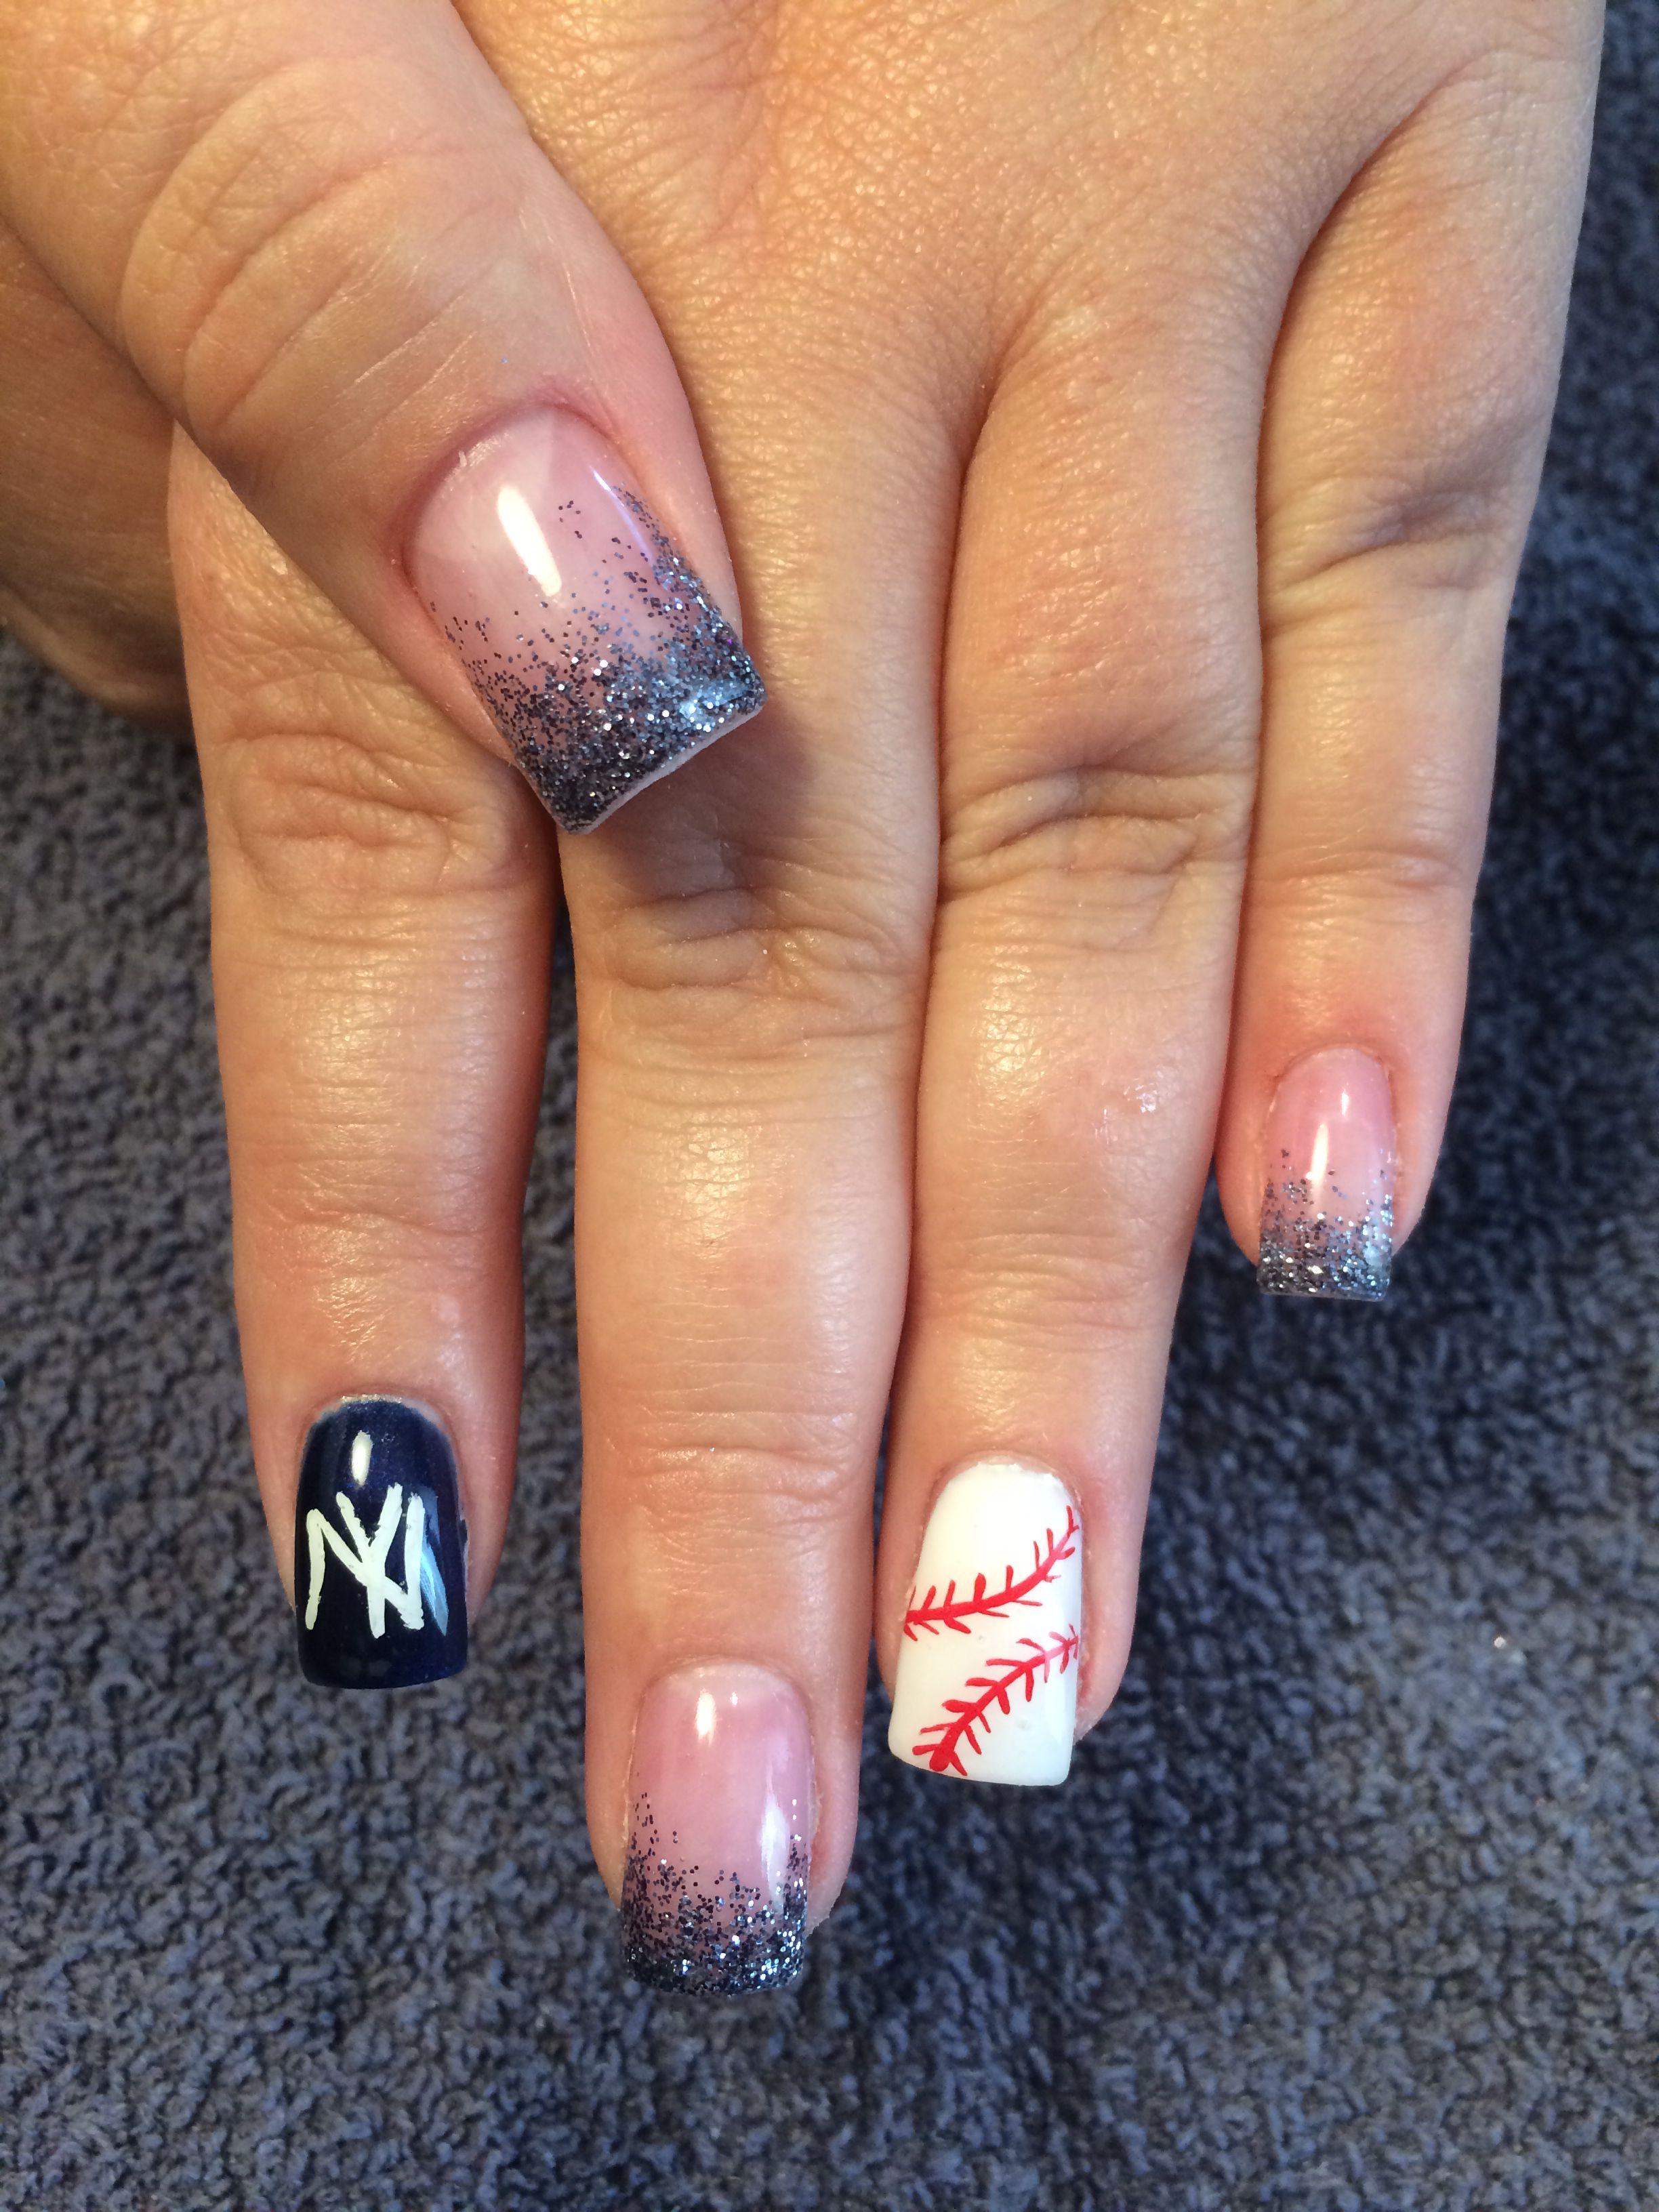 Gel nails New York Yankee baseball style | Nails | Pinterest ...